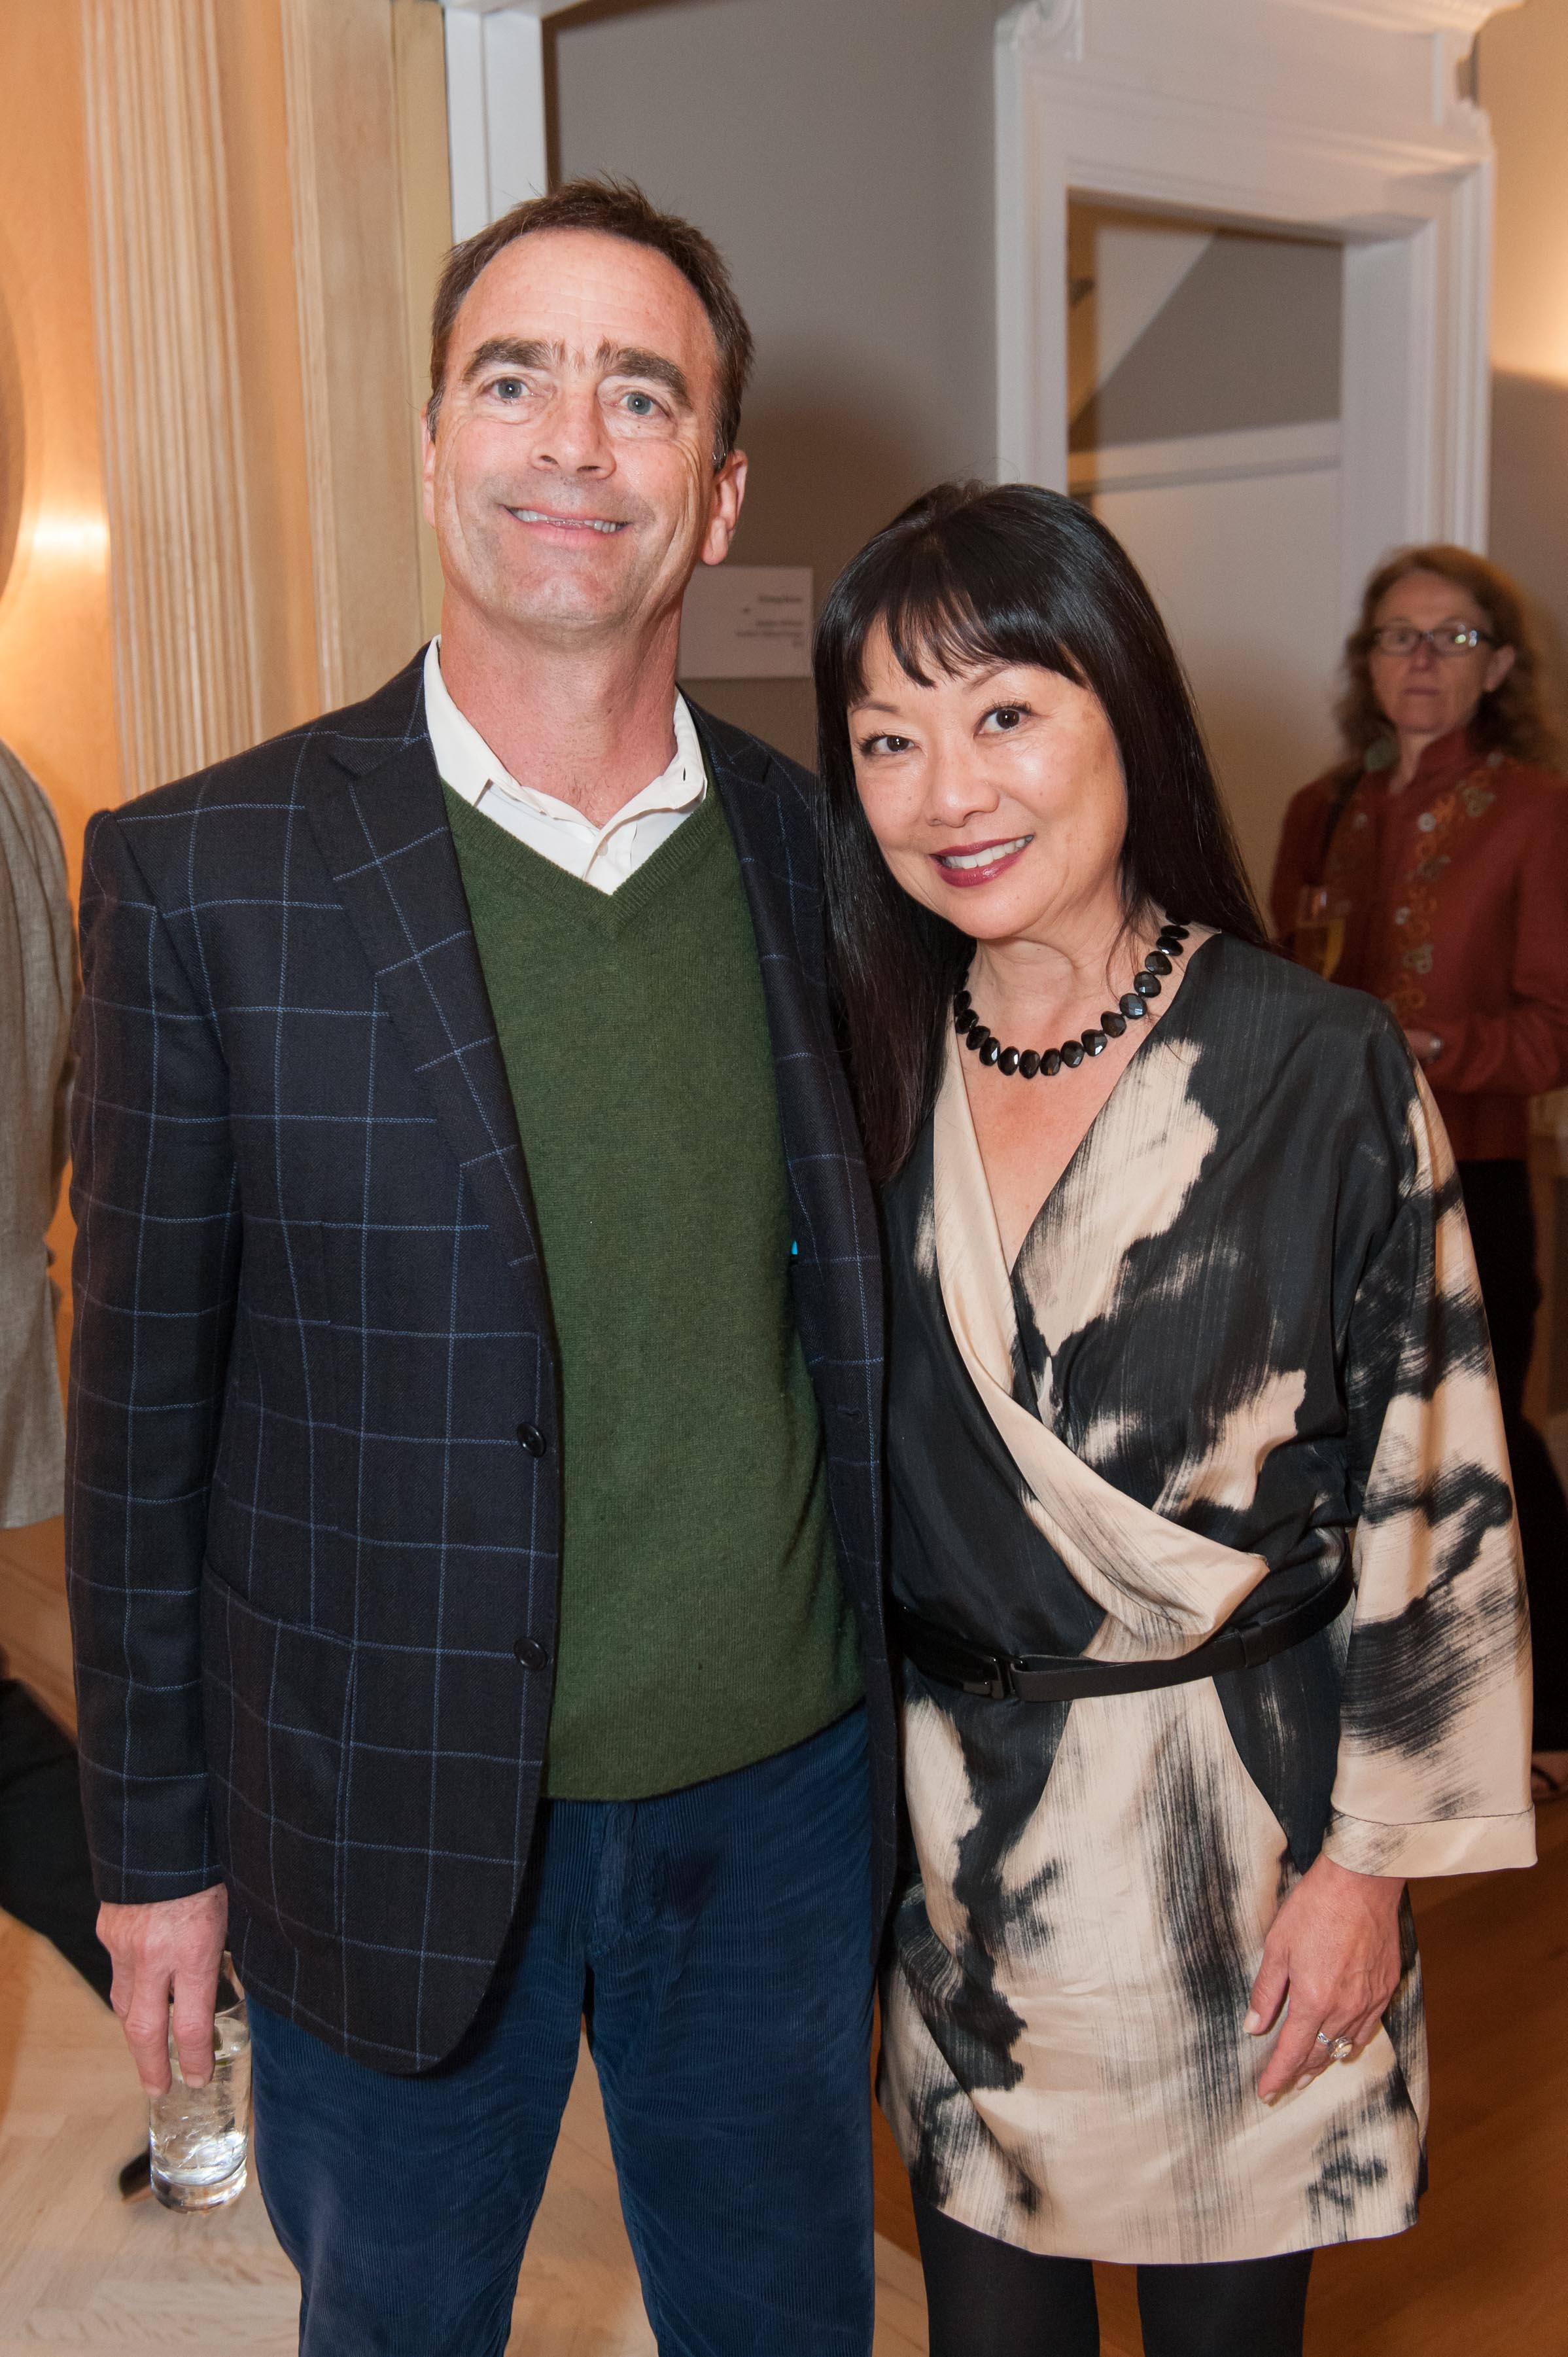 Steven Dinkelspiel, Rhonda Hirata